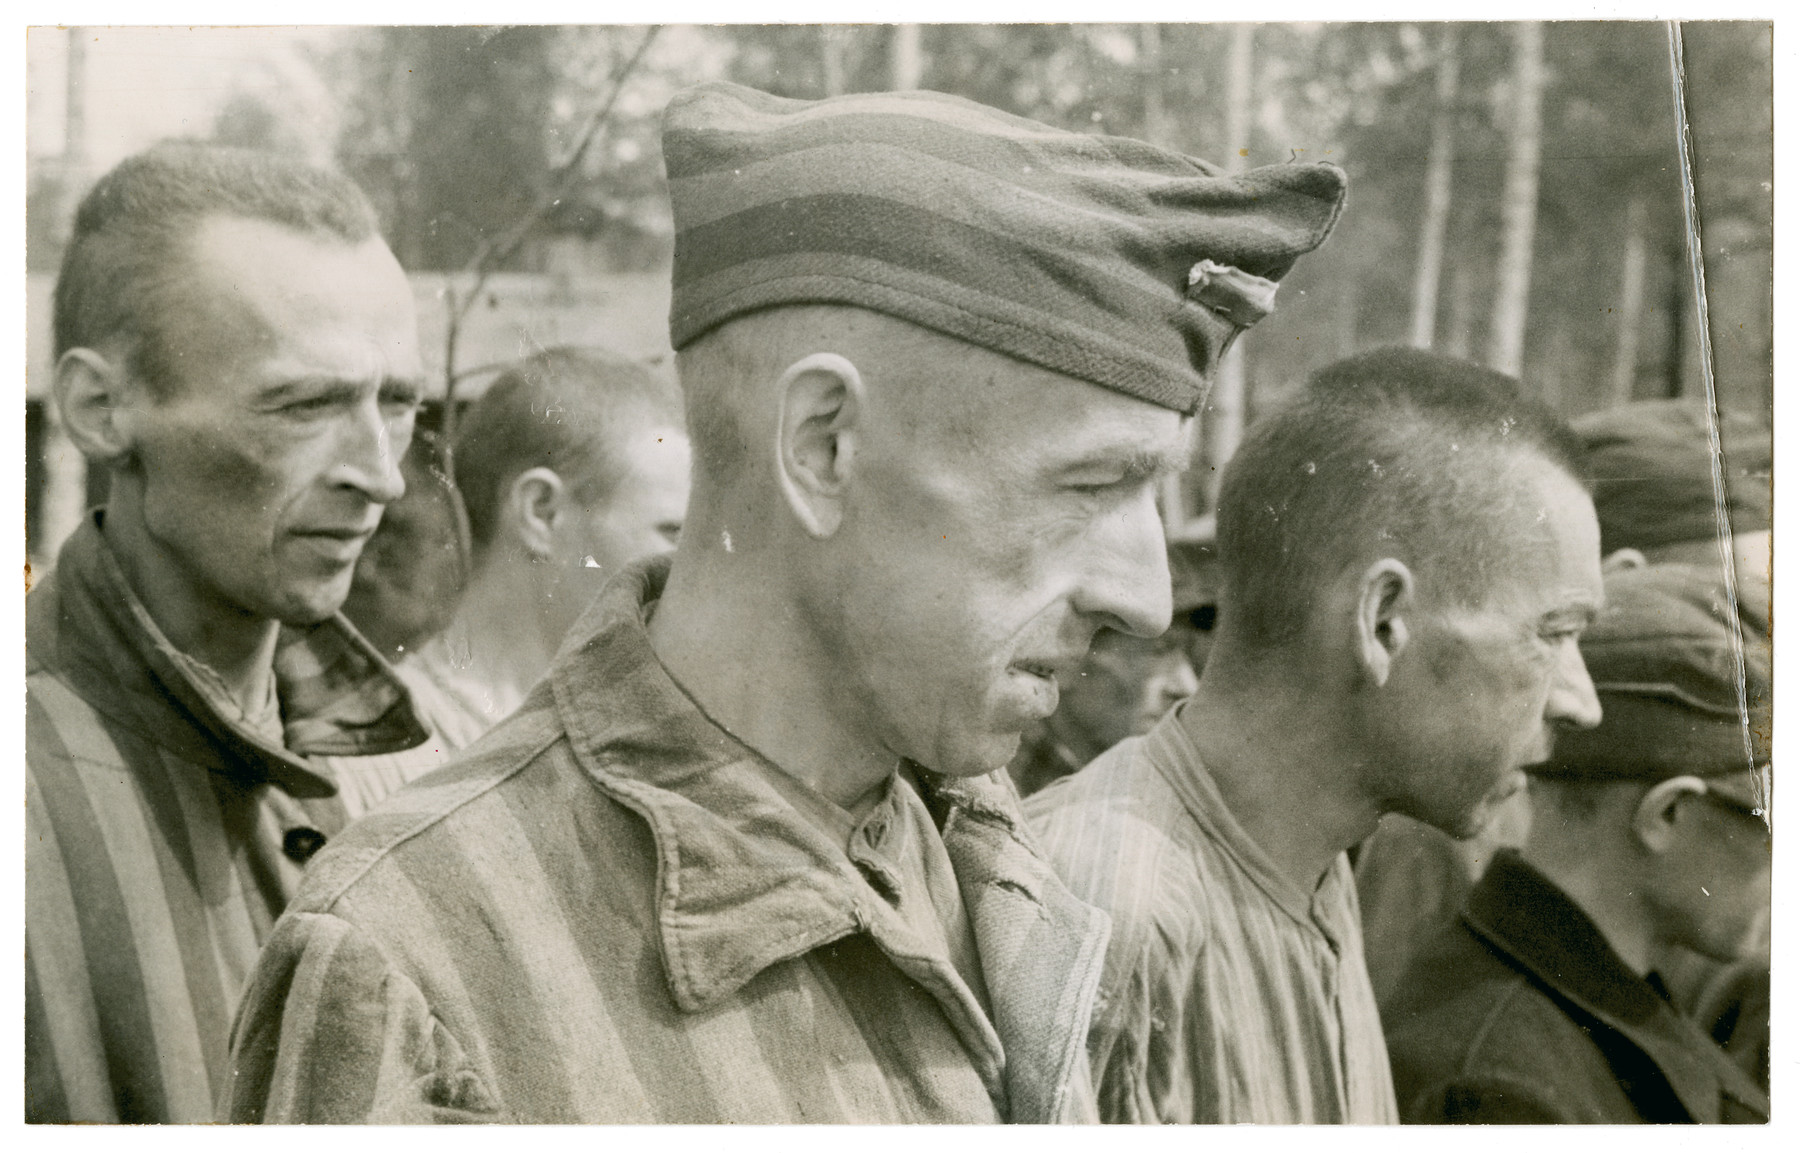 Survivors from the Langenstein-Zwieberge concentration camp.